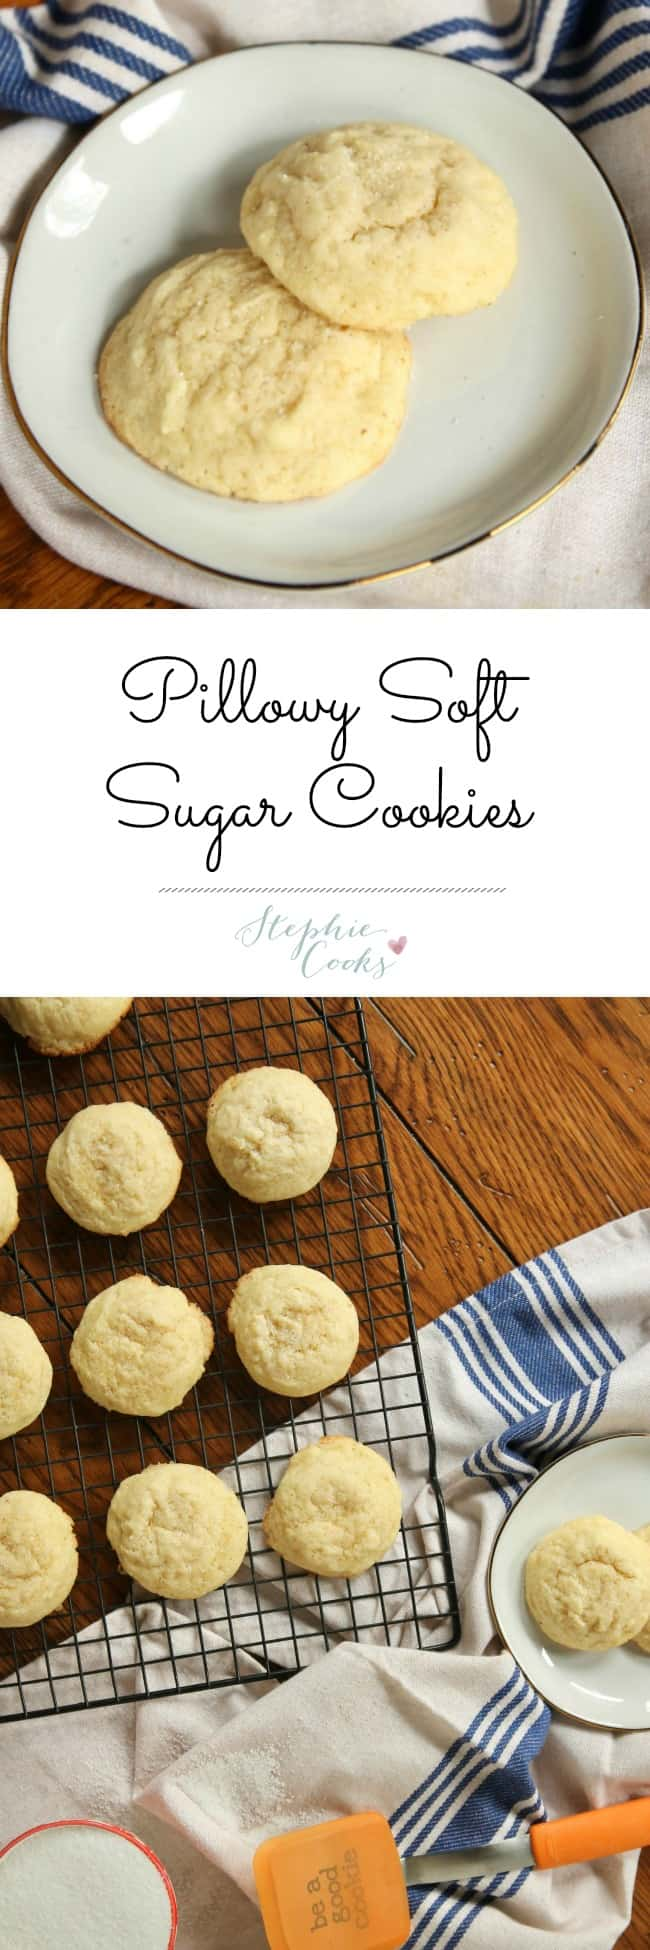 Pillowy Soft Sugar Cookies